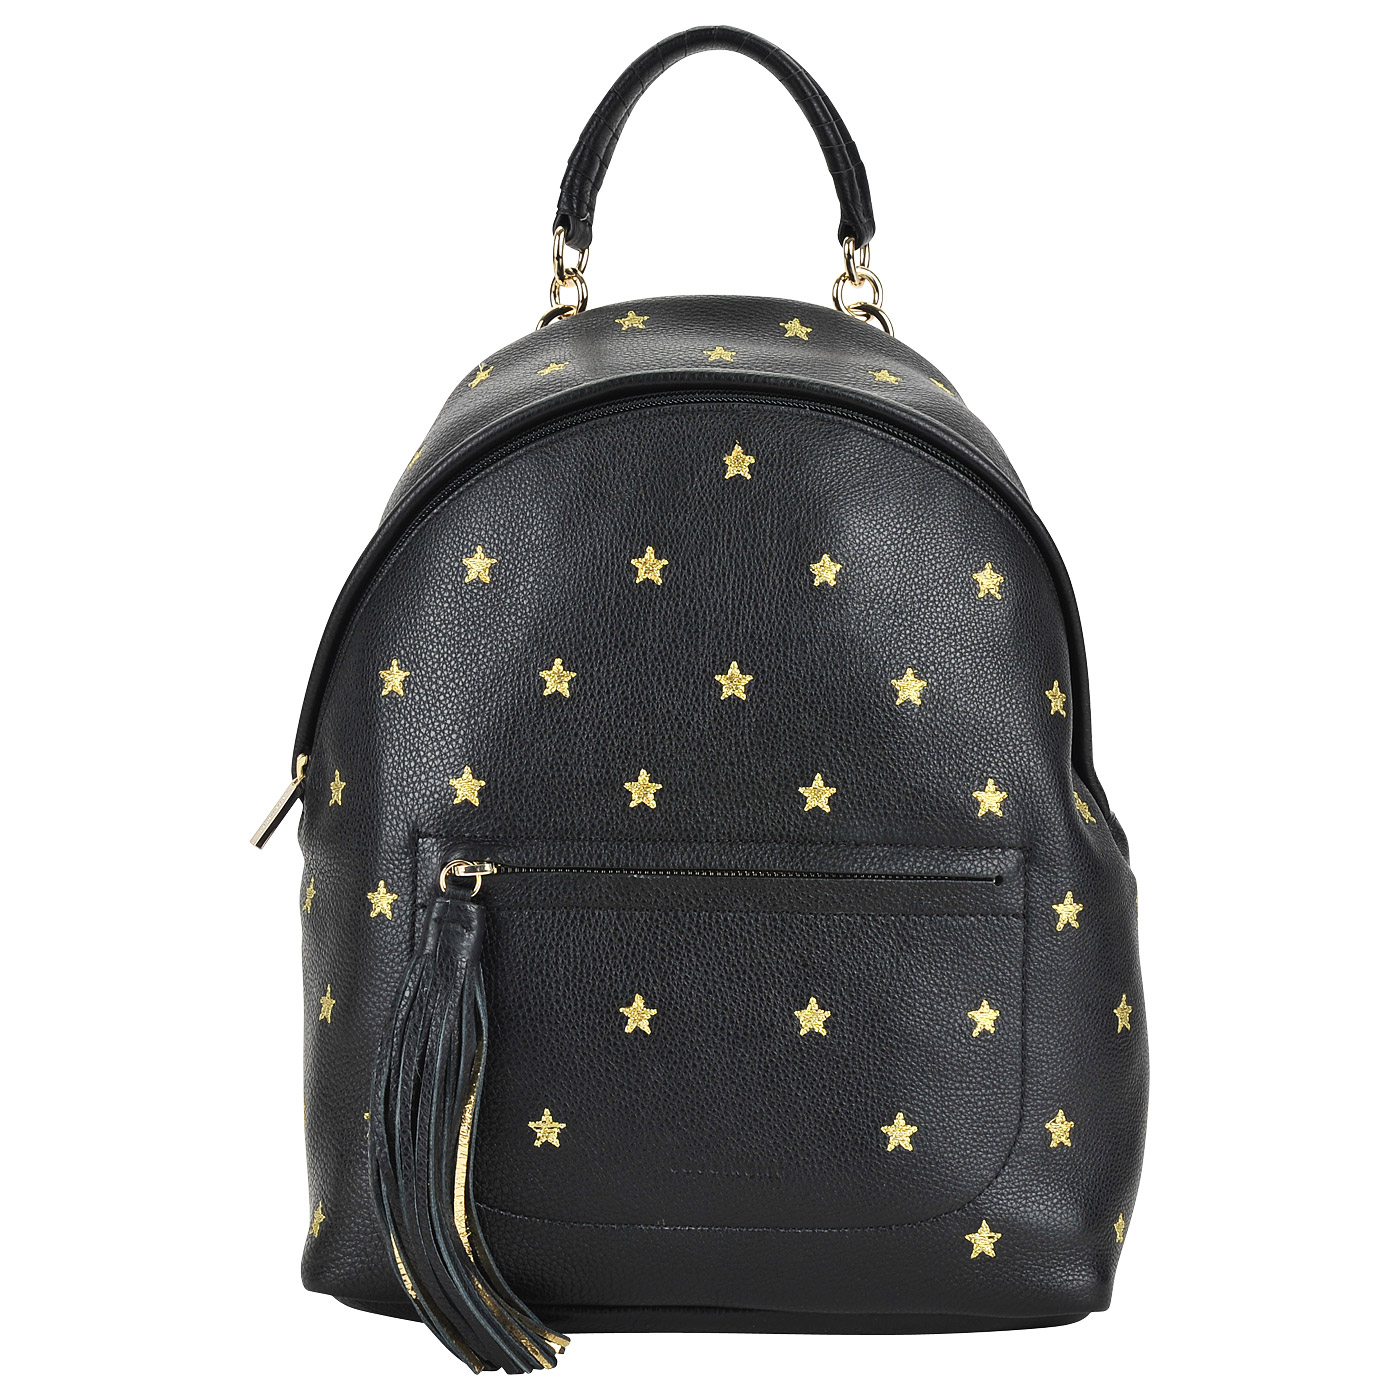 b0d18e2378d7 ... Женский кожаный рюкзак с вышивкой Coccinelle Leonie embroidery ...